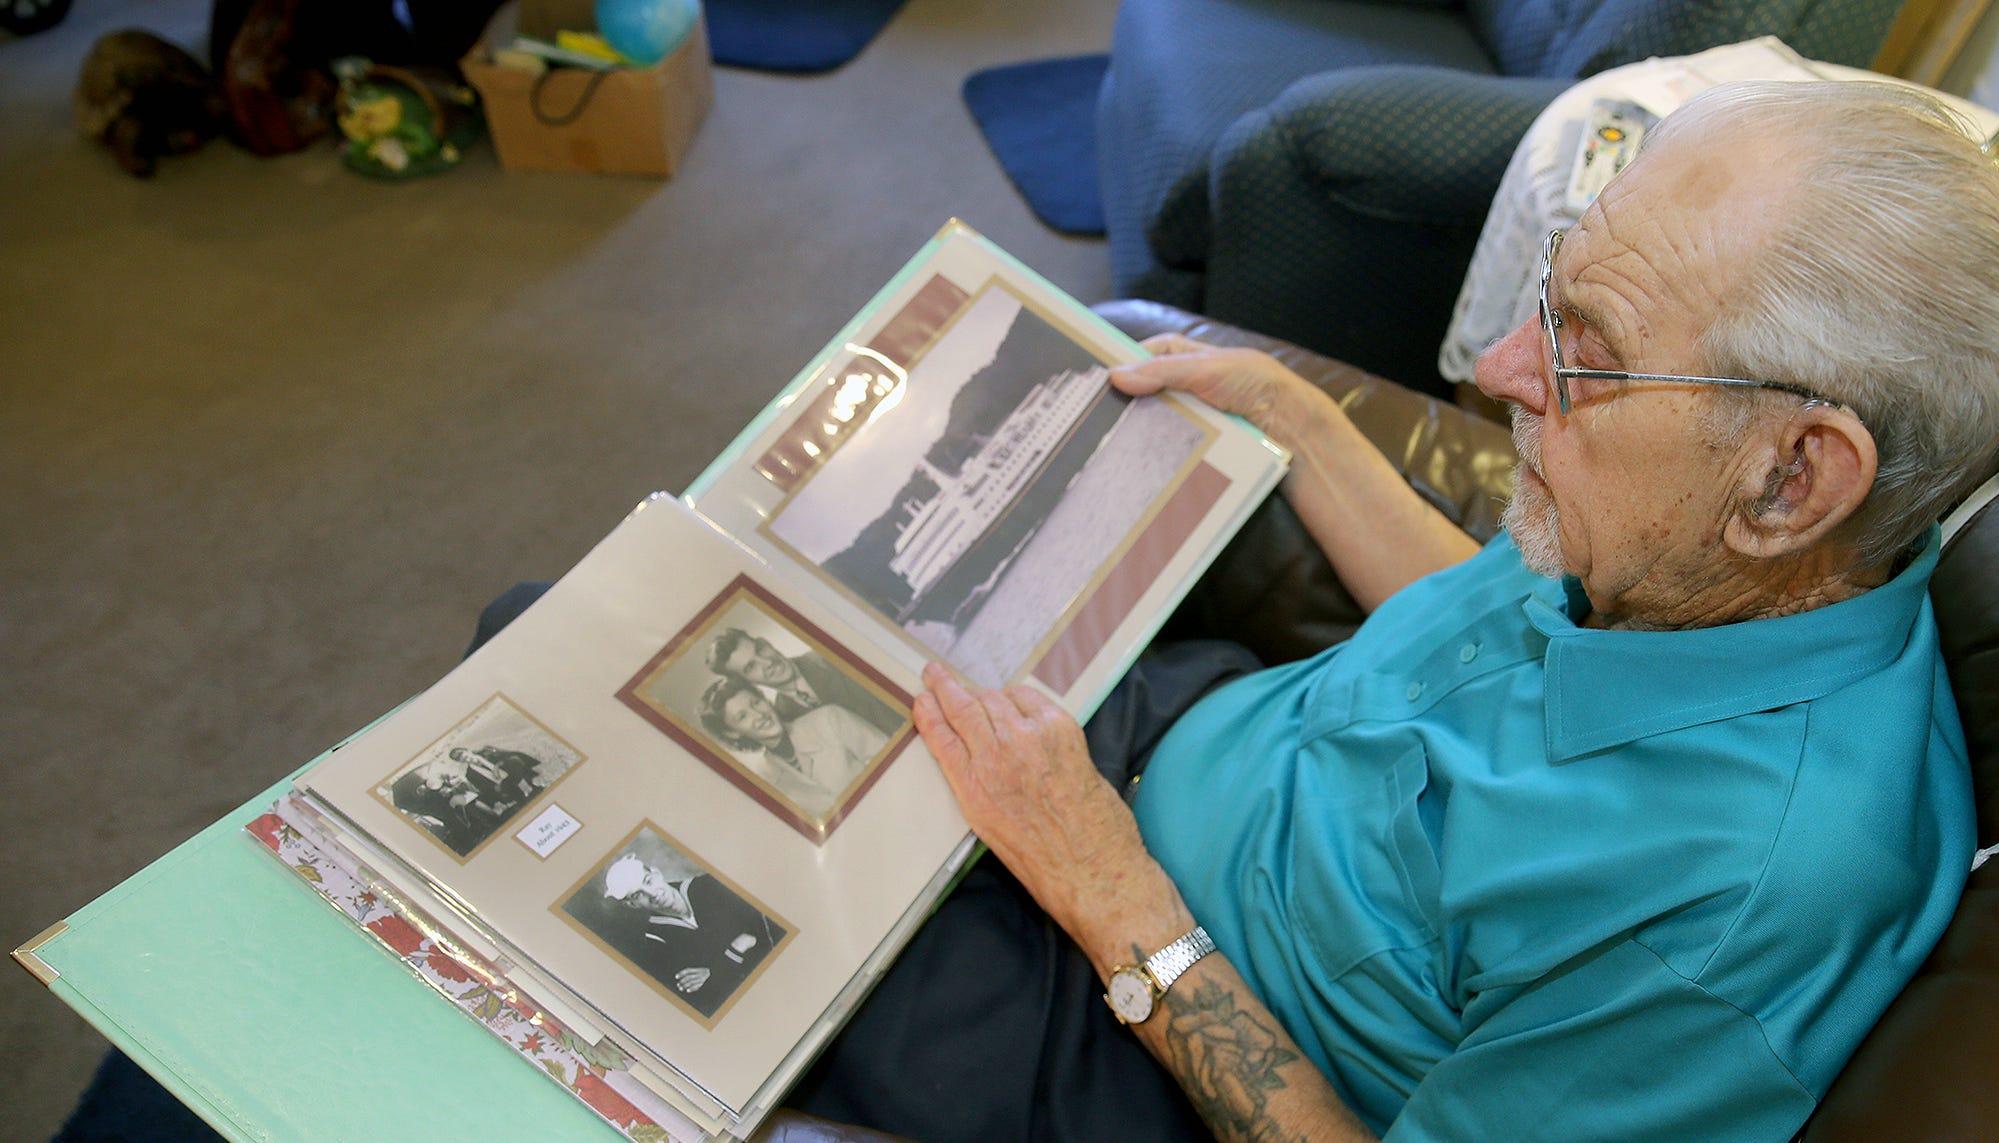 Silverdale Navy veteran among first to see aftermath of atomic bomb at Nagasaki